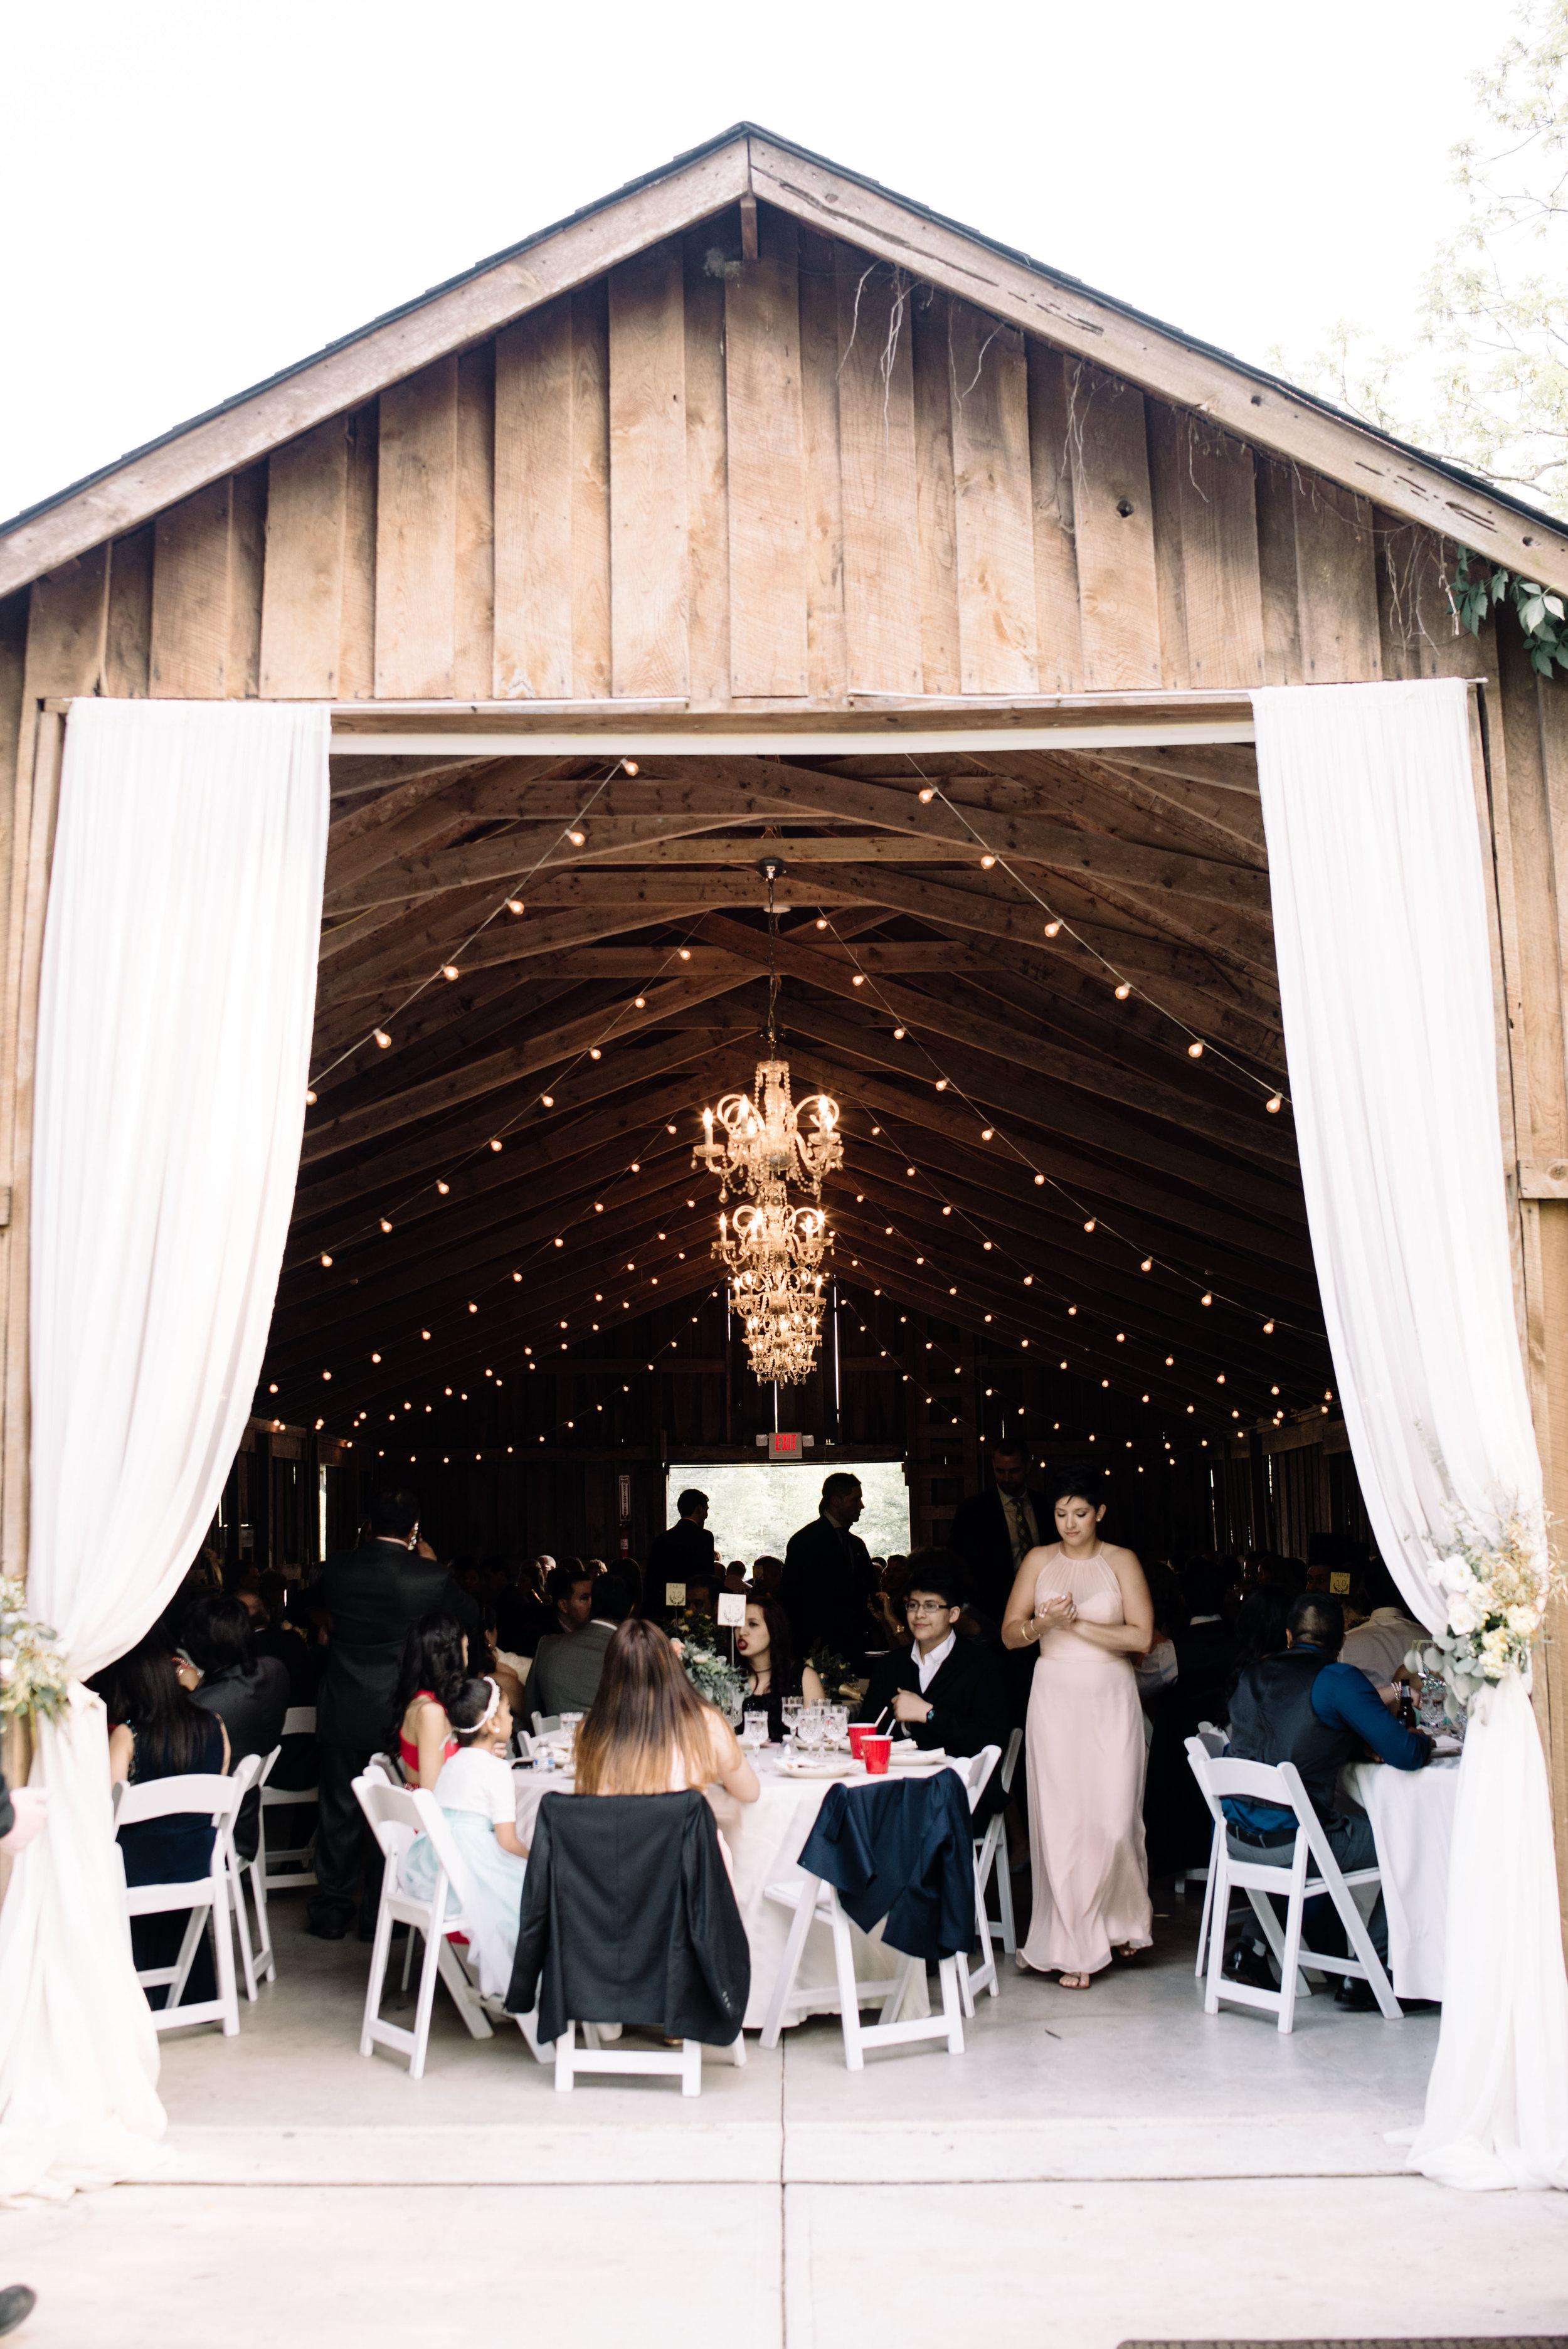 Ana-Dan-Blog-Indianapolis-Wedding-79.jpg